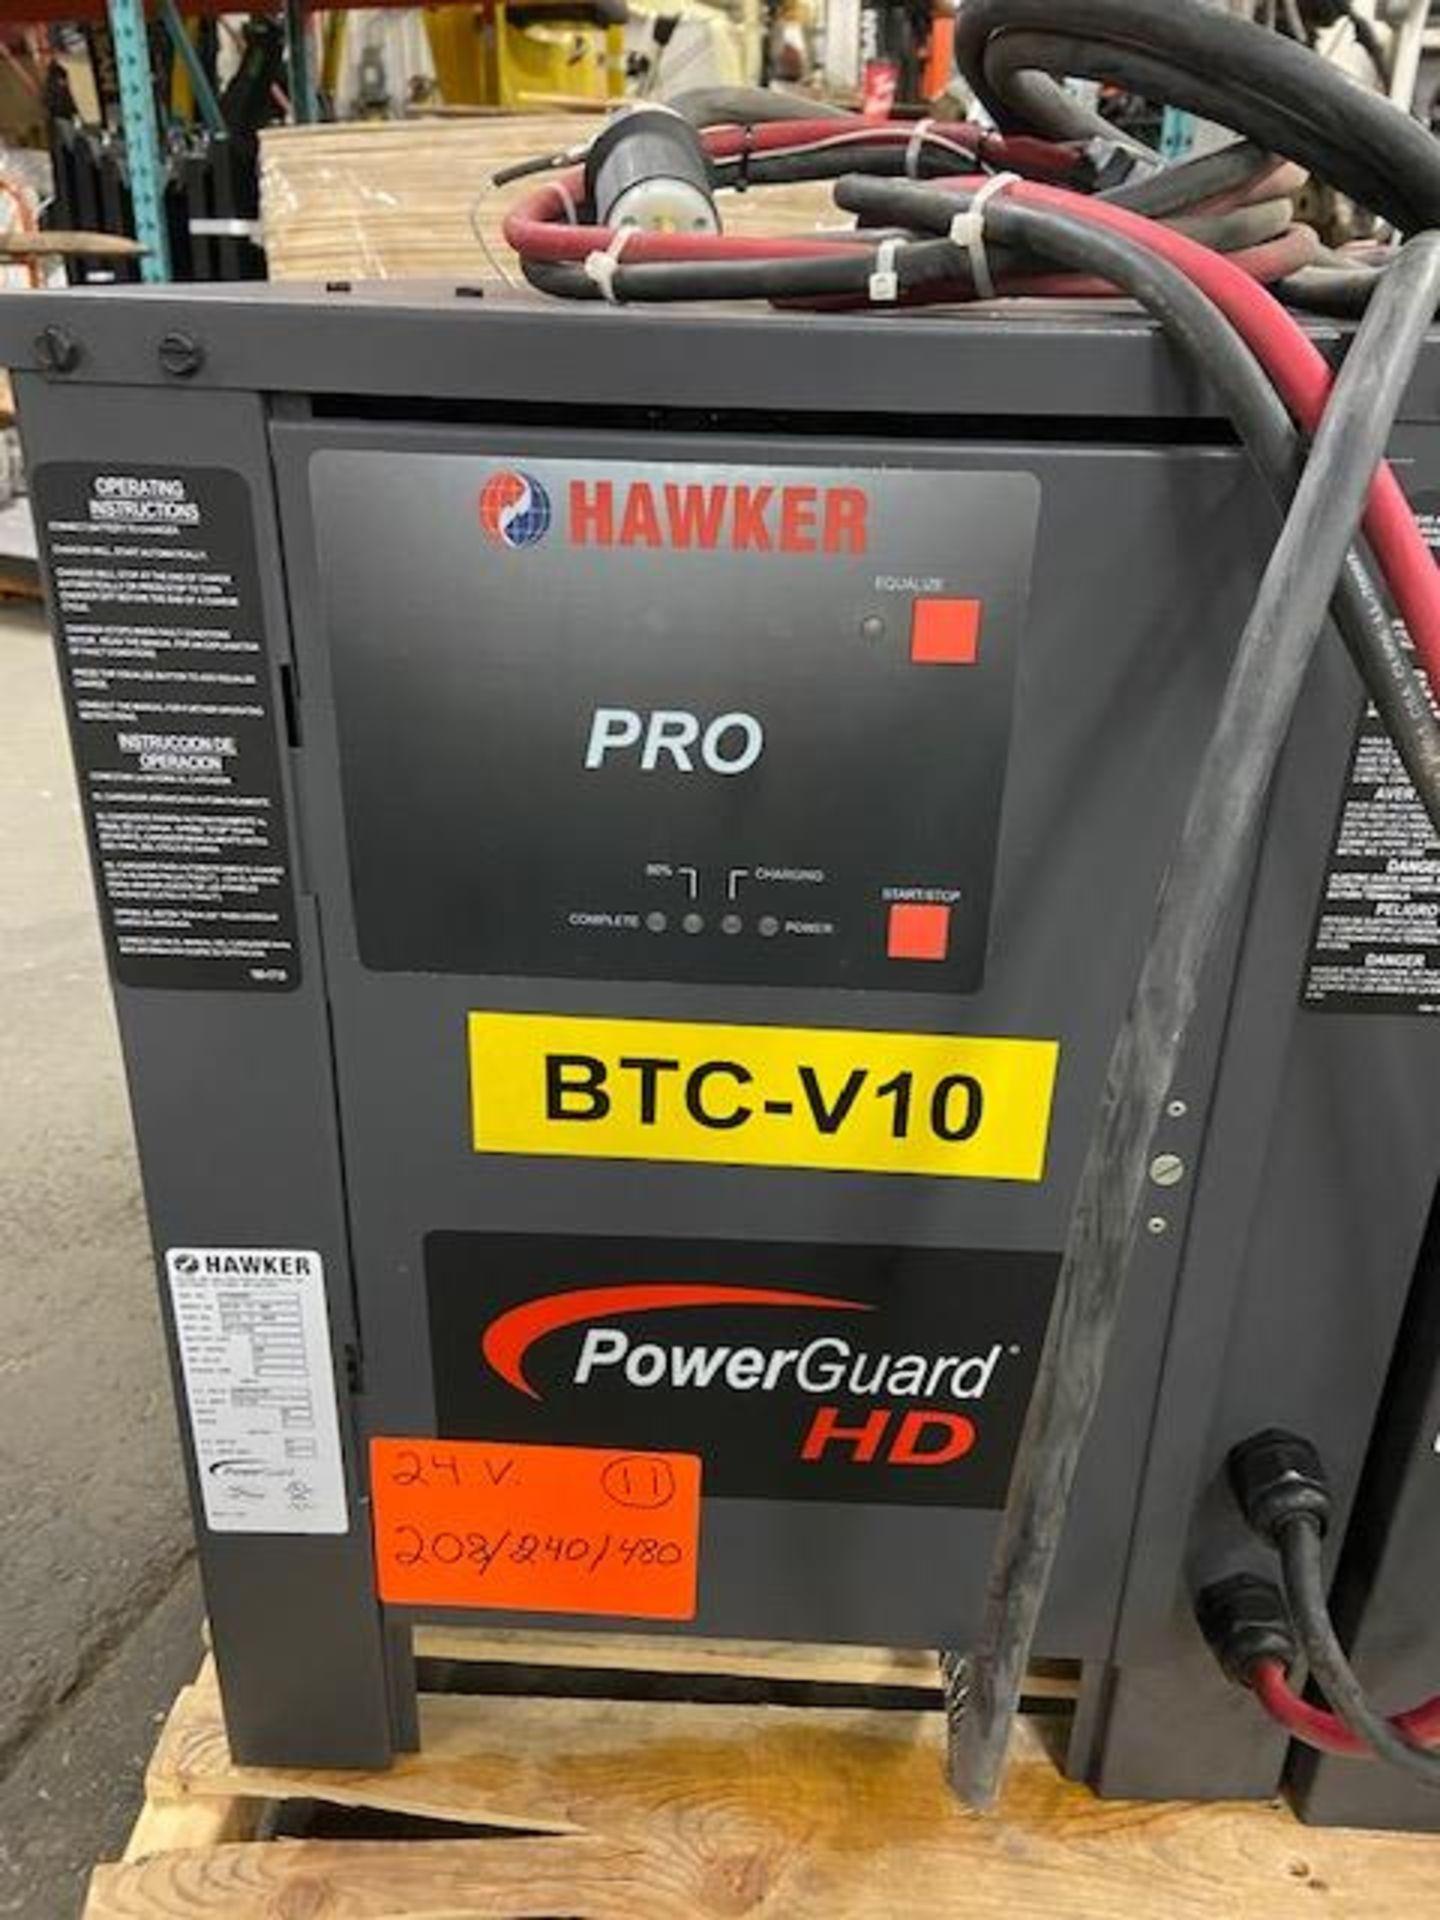 Hawker Pro PowerGuard HD Forklift Battery Charger 24V - 208/240/480V